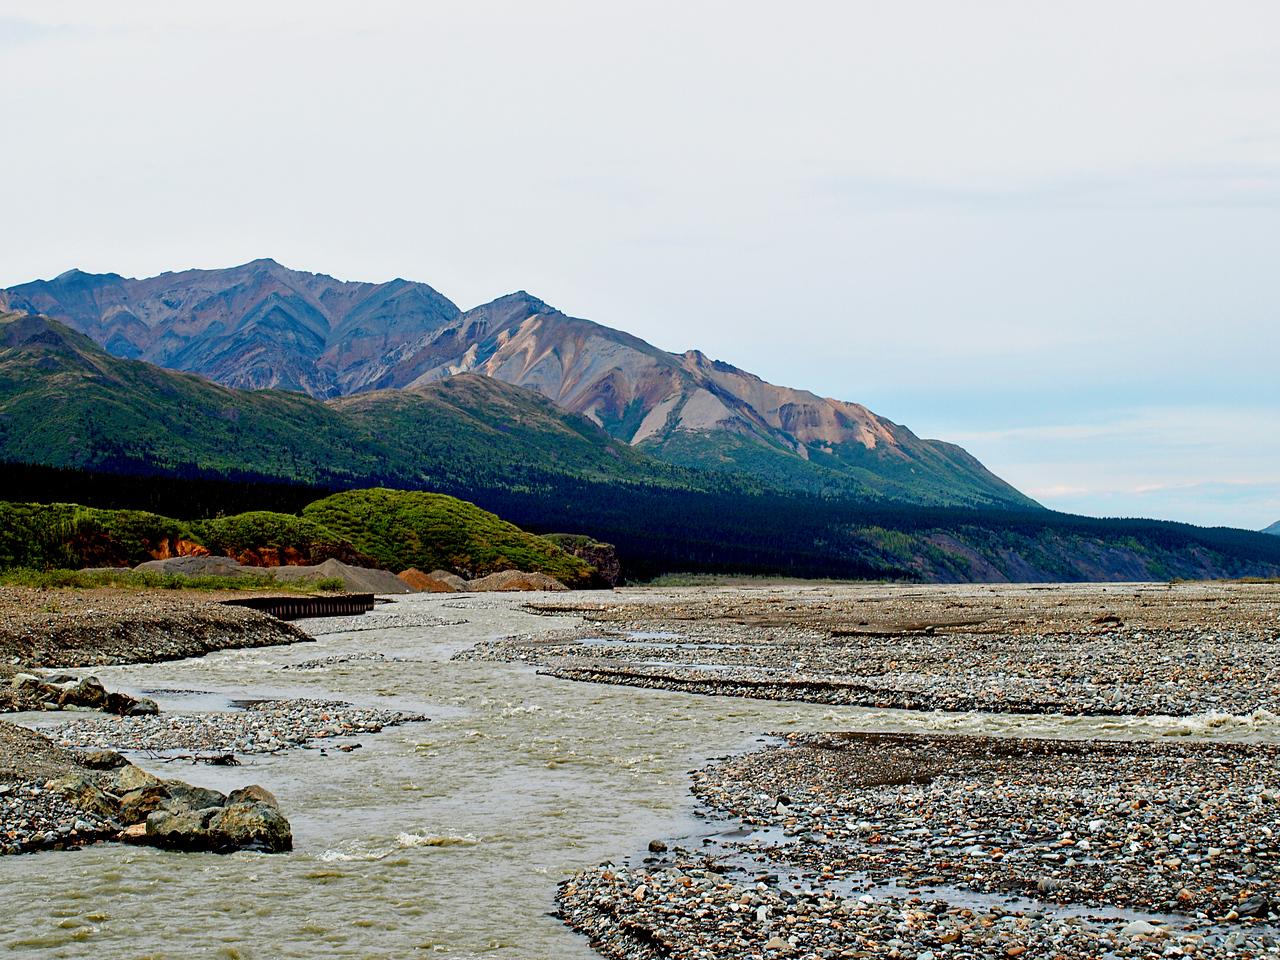 Toklat River in Denali National Park  By Troy Mellema  June 7, 2011  Order Code: C11